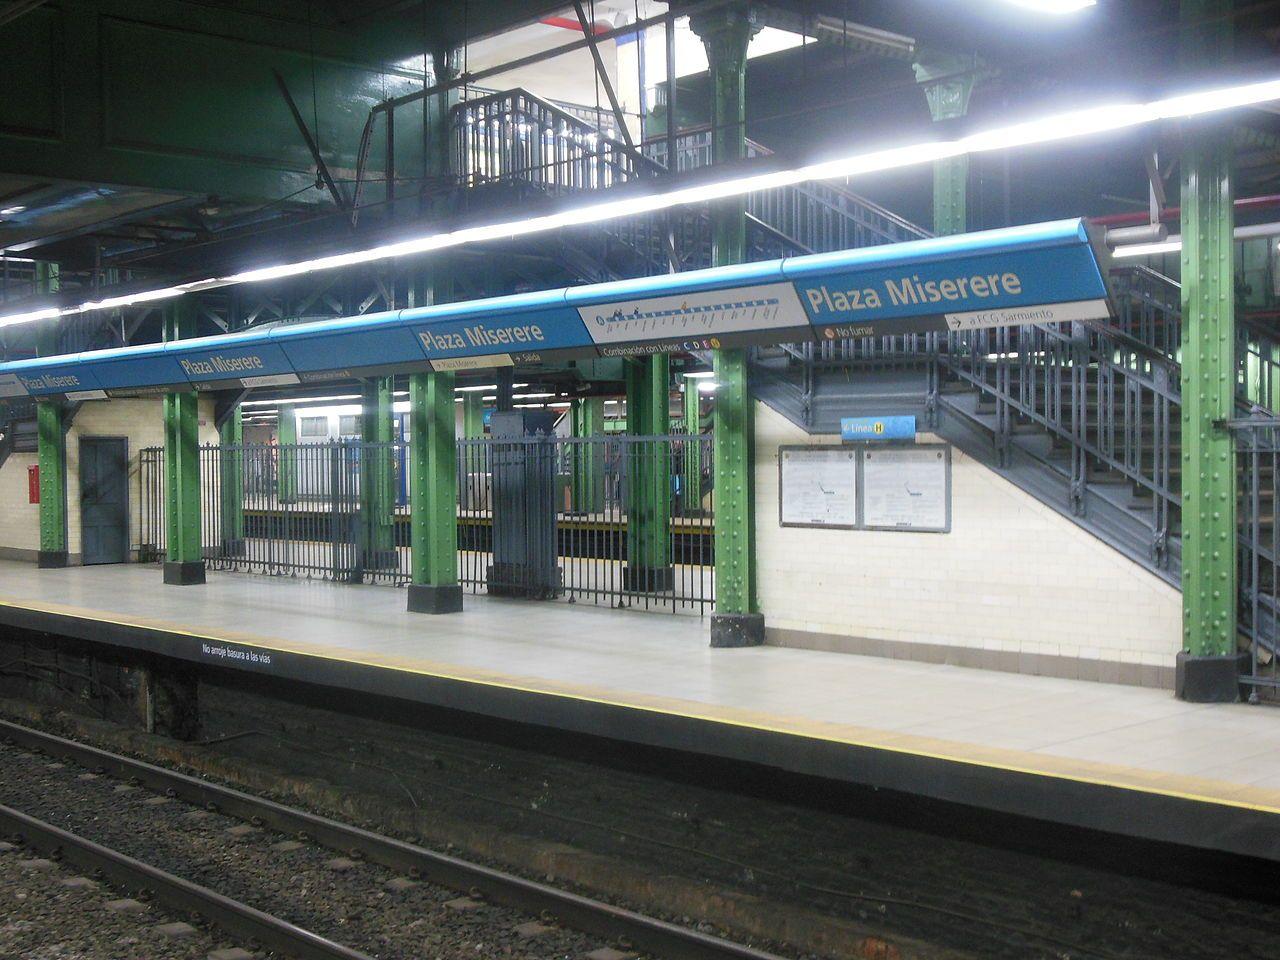 Estación Plaza Miserere